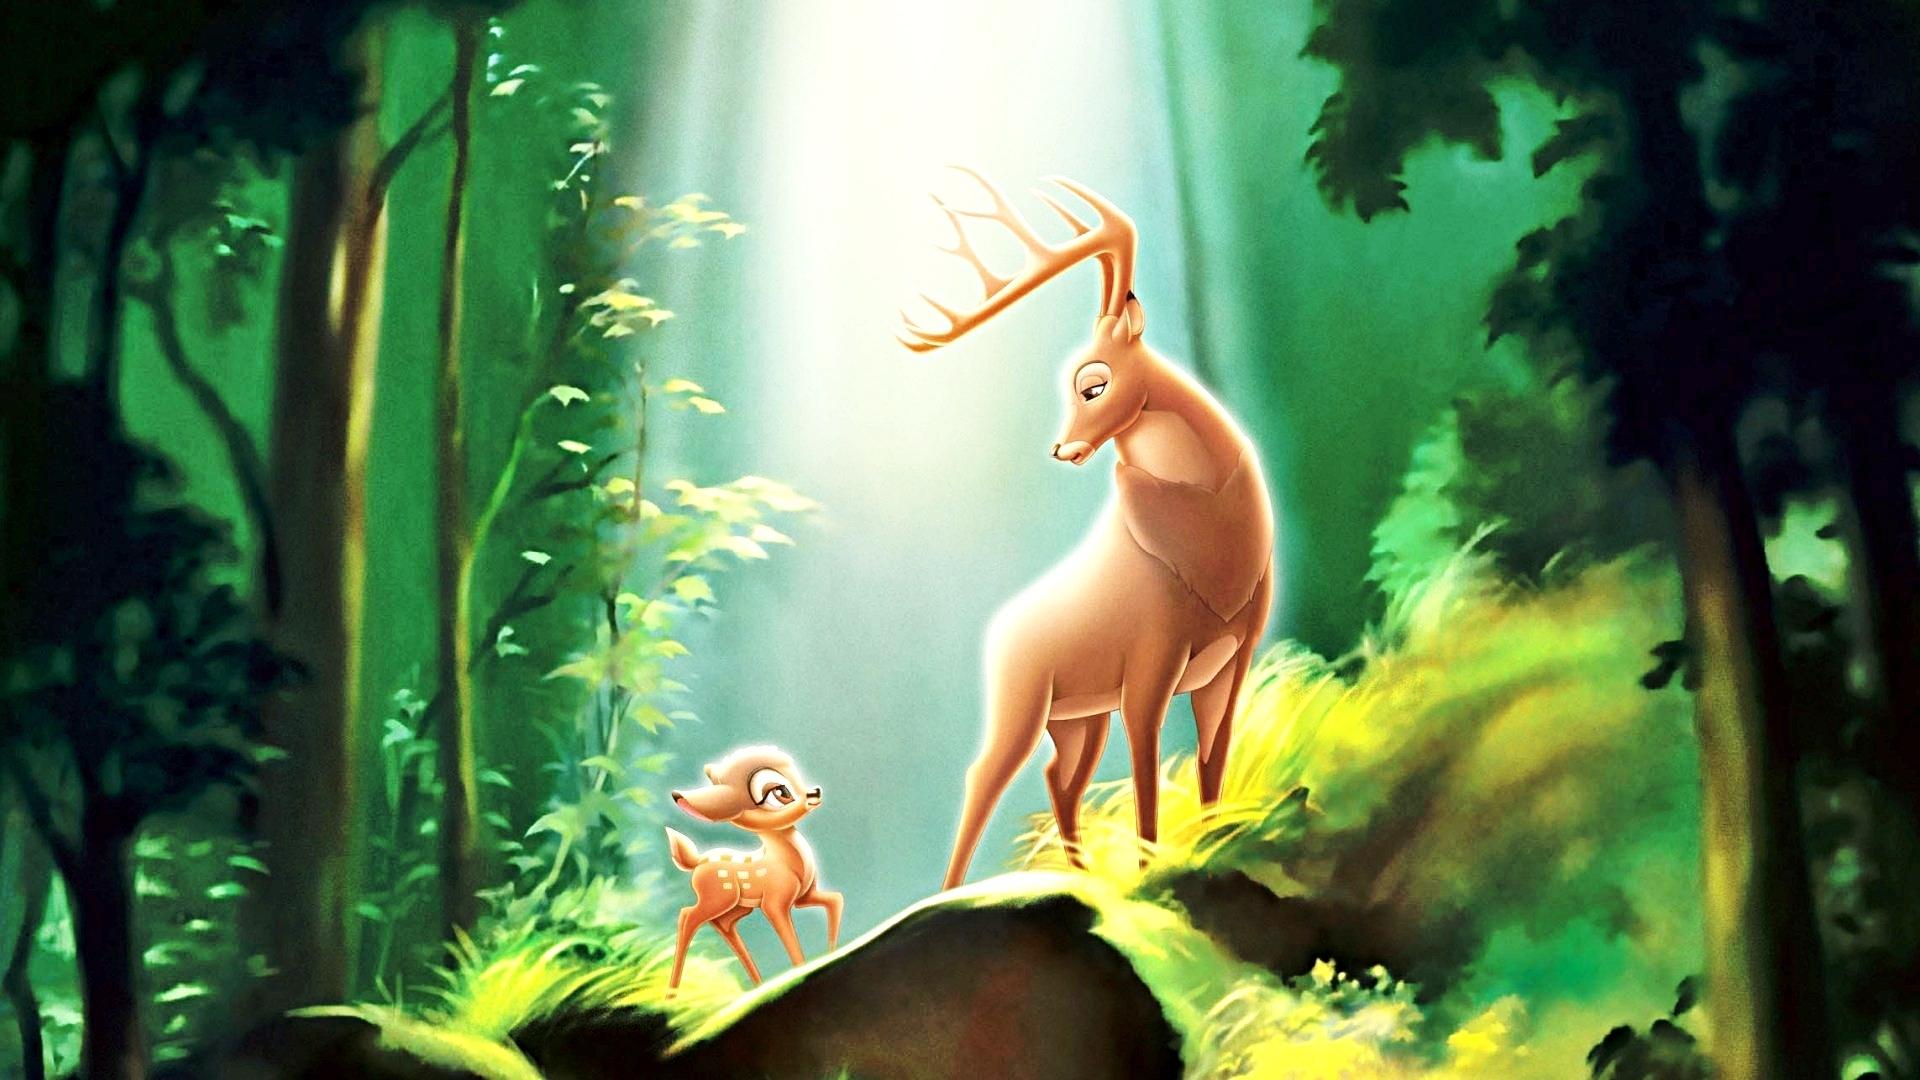 walt disney wallpapers bambi 2 walt disney characters